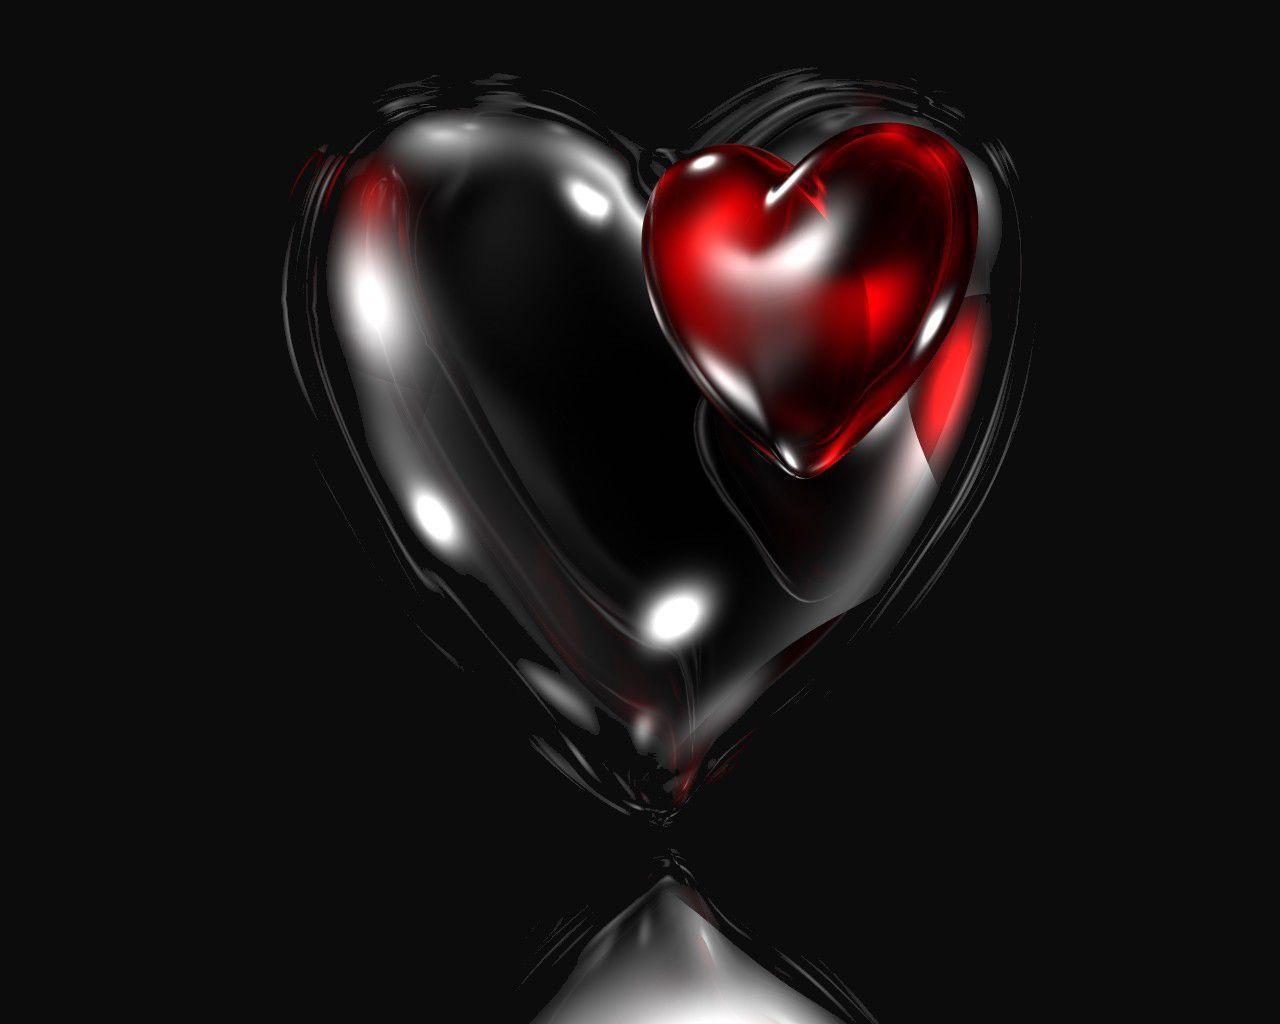 Sweetheart Broken Heart Wallpaper Heart Wallpaper Love Wallpaper Backgrounds